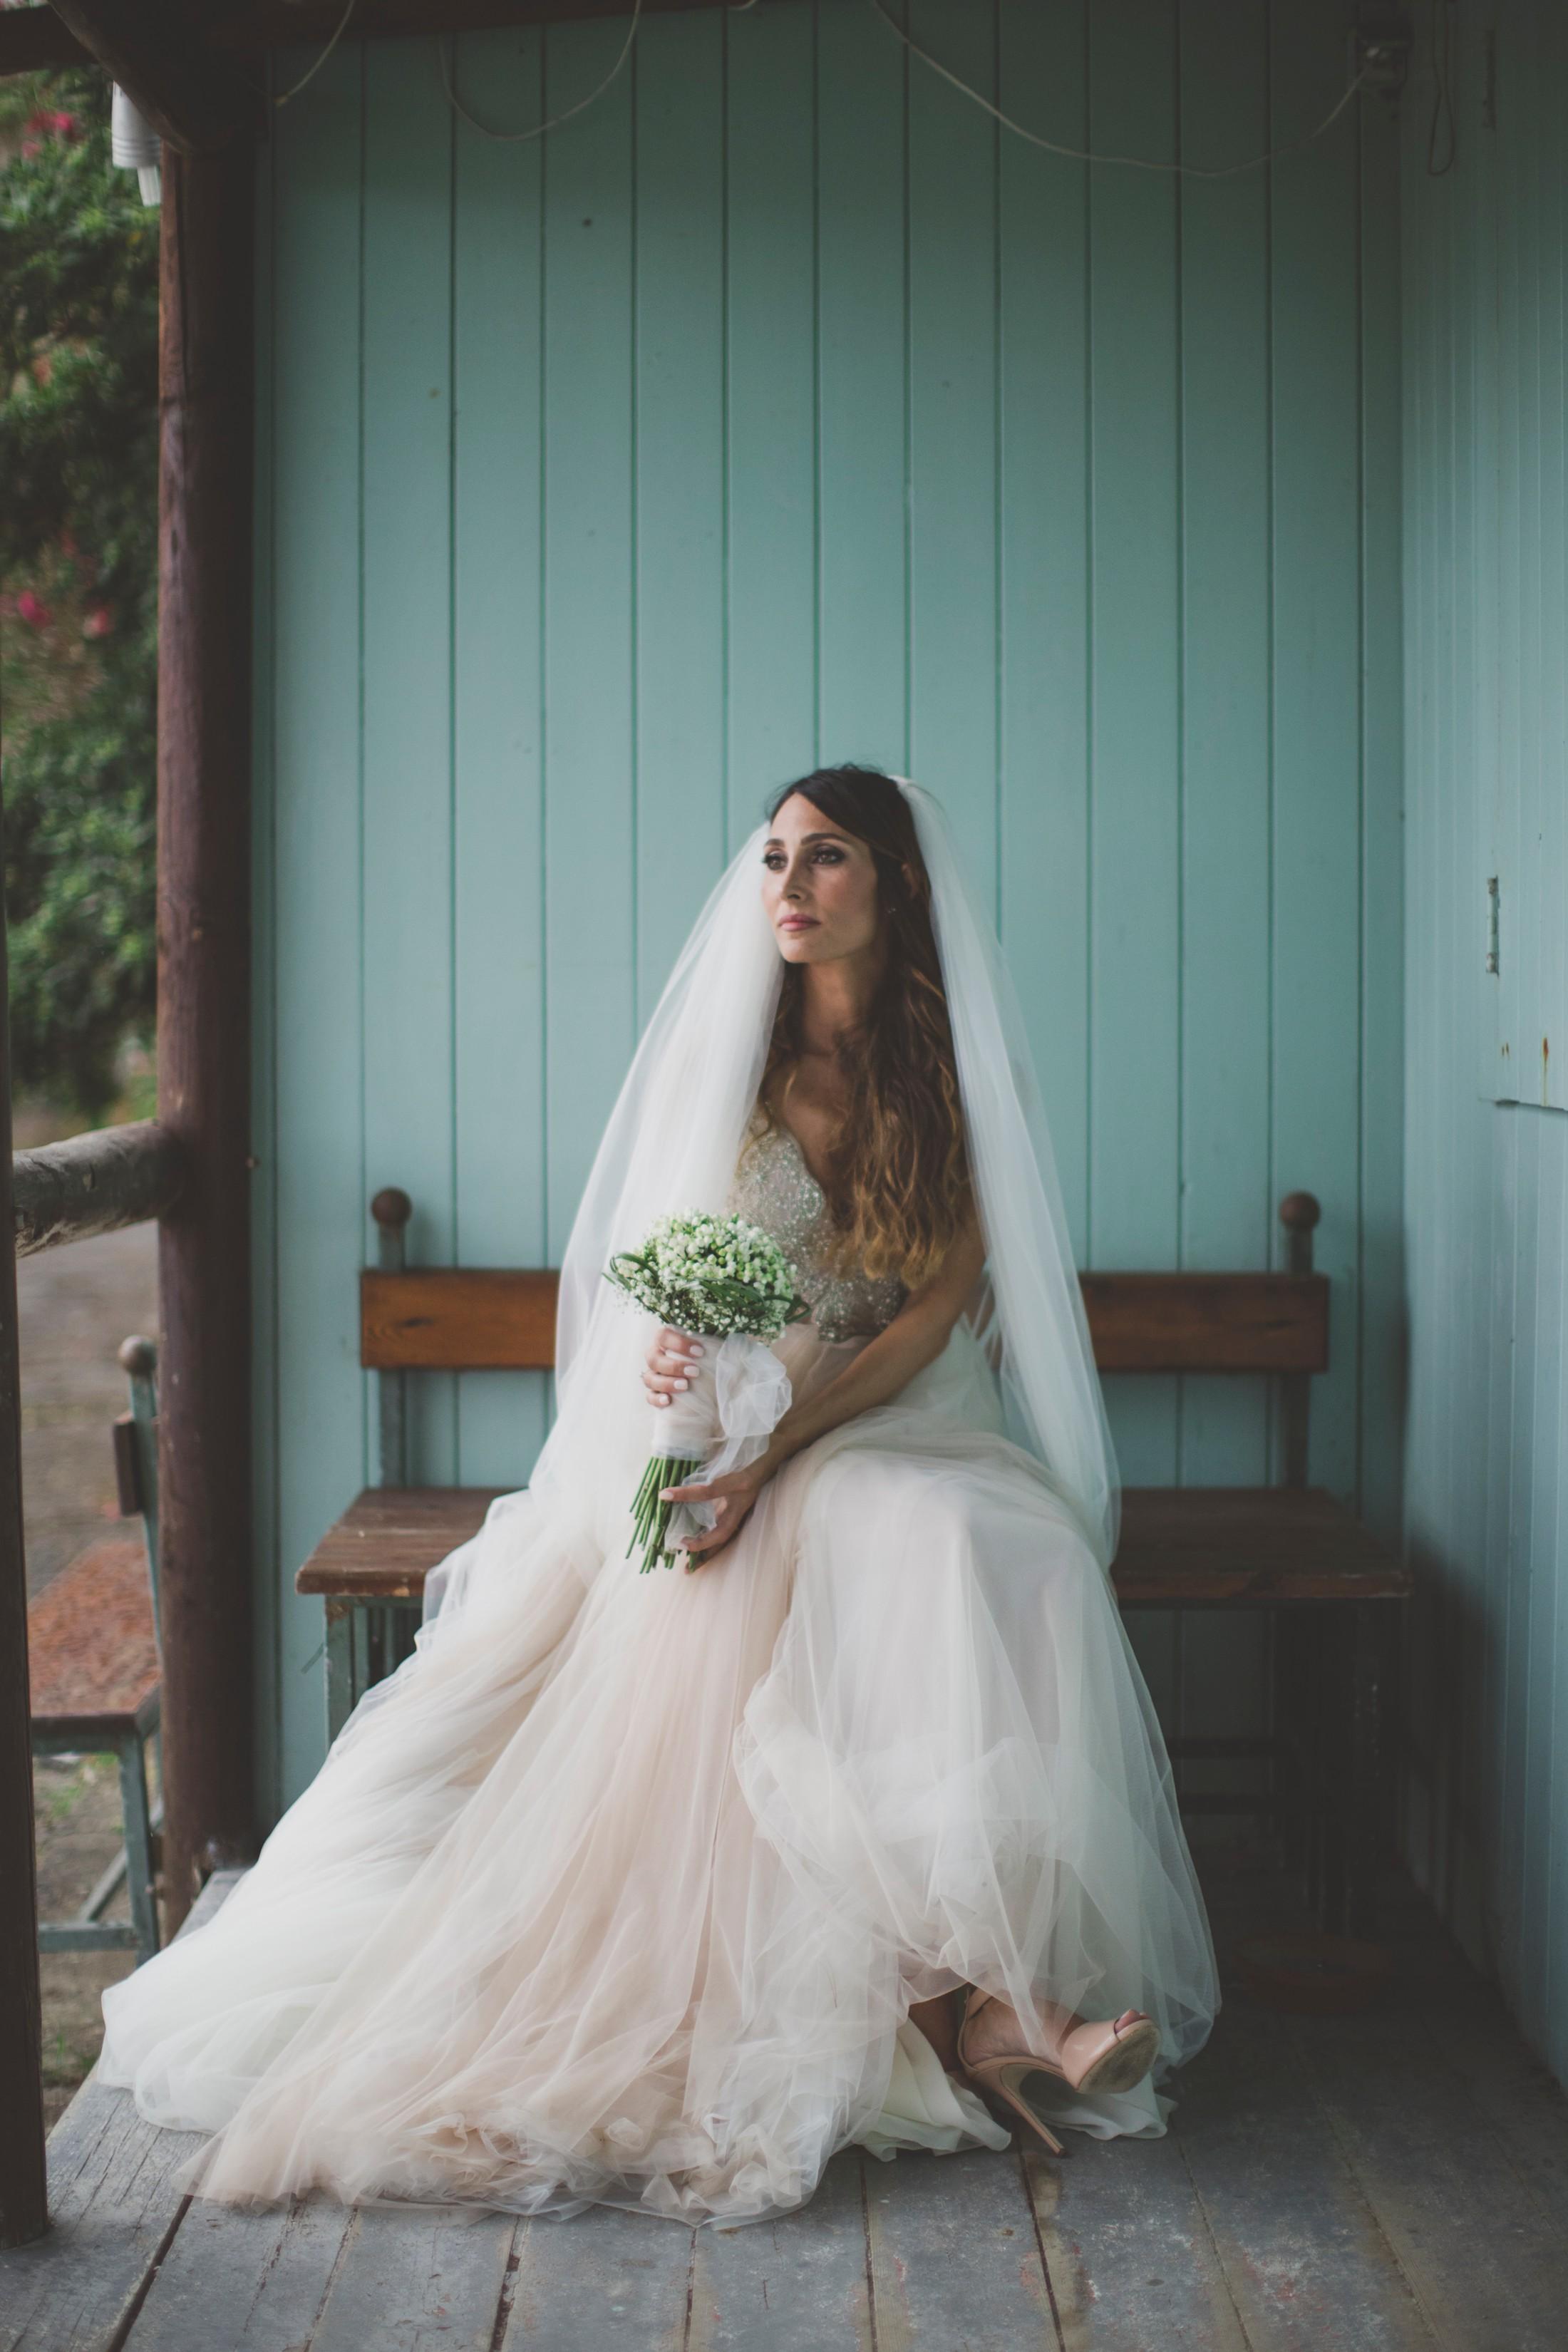 sorrento wedding bride's portrait by the beach